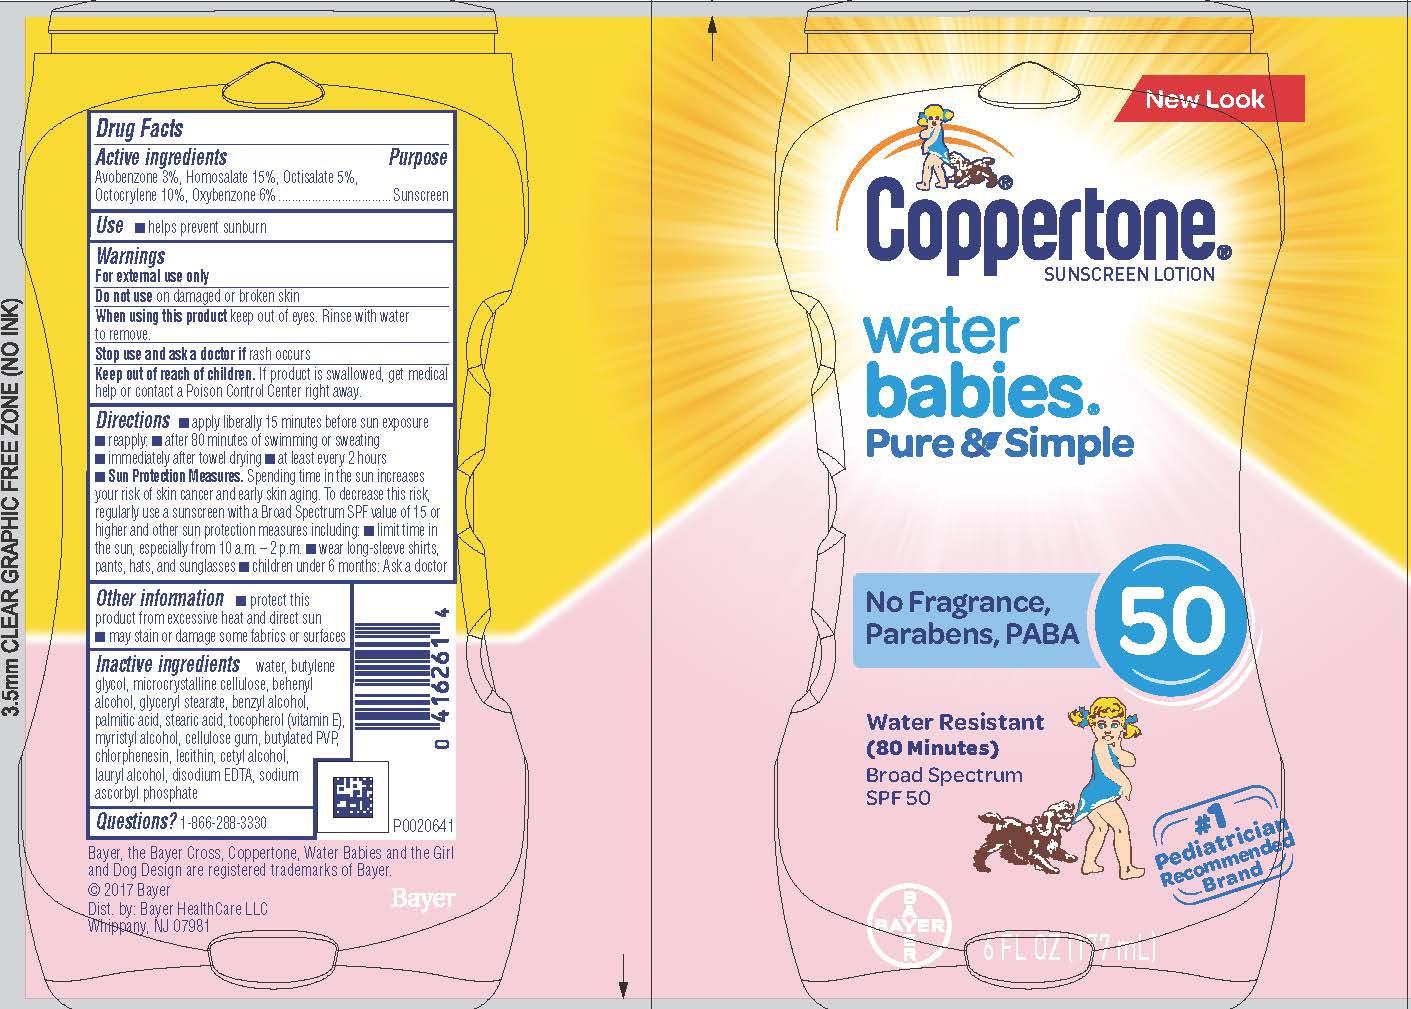 6 oz bottle label